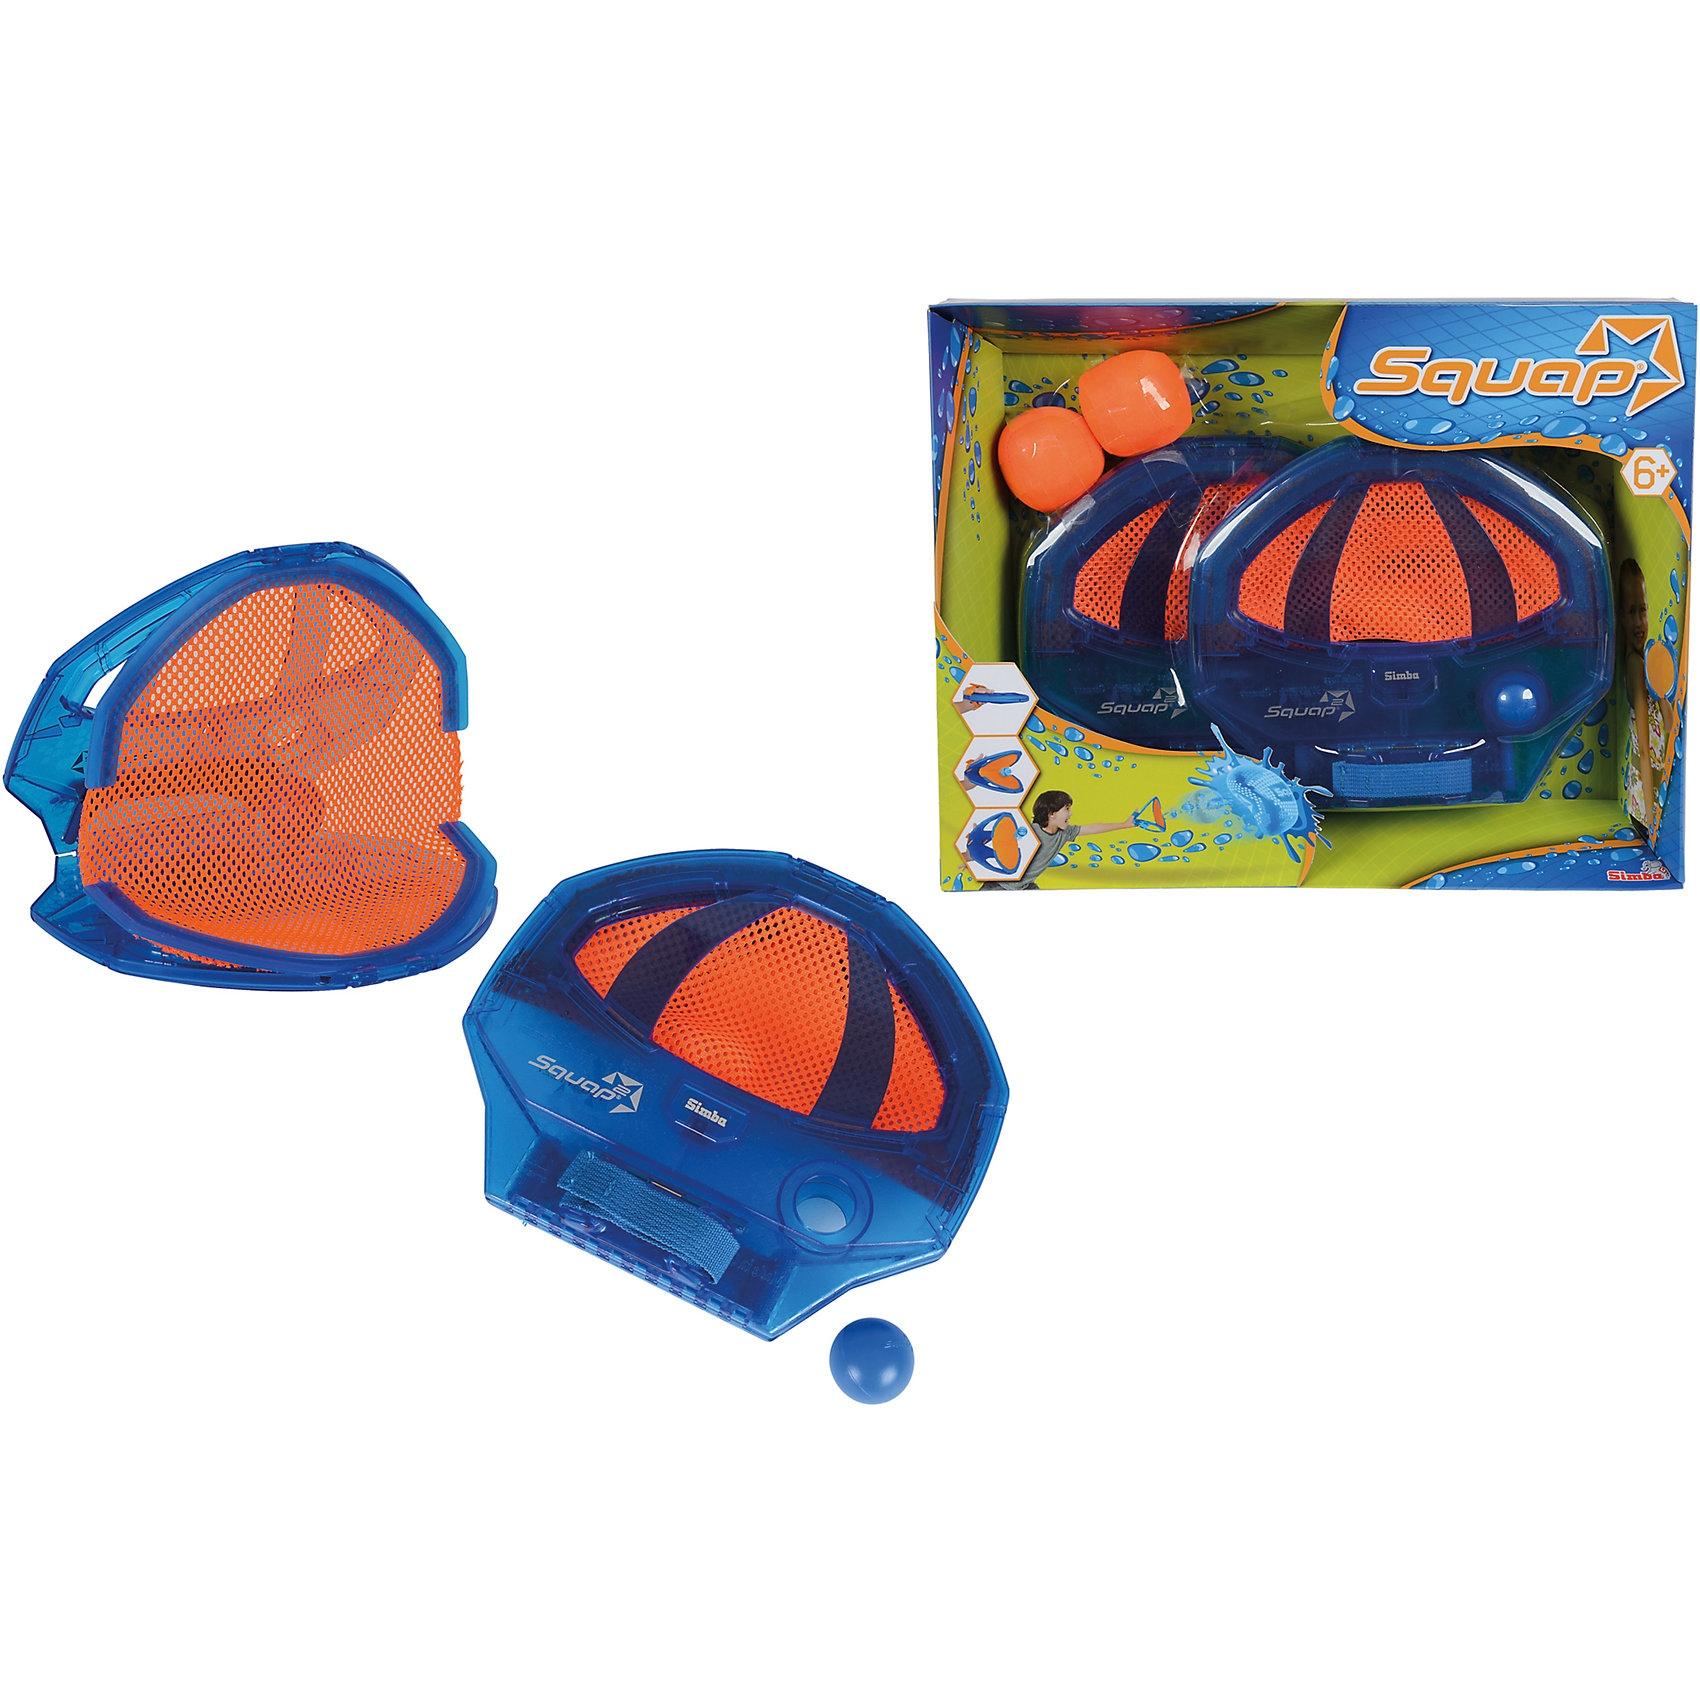 Simba Squap Fangspiel Splash Version (Wasser)